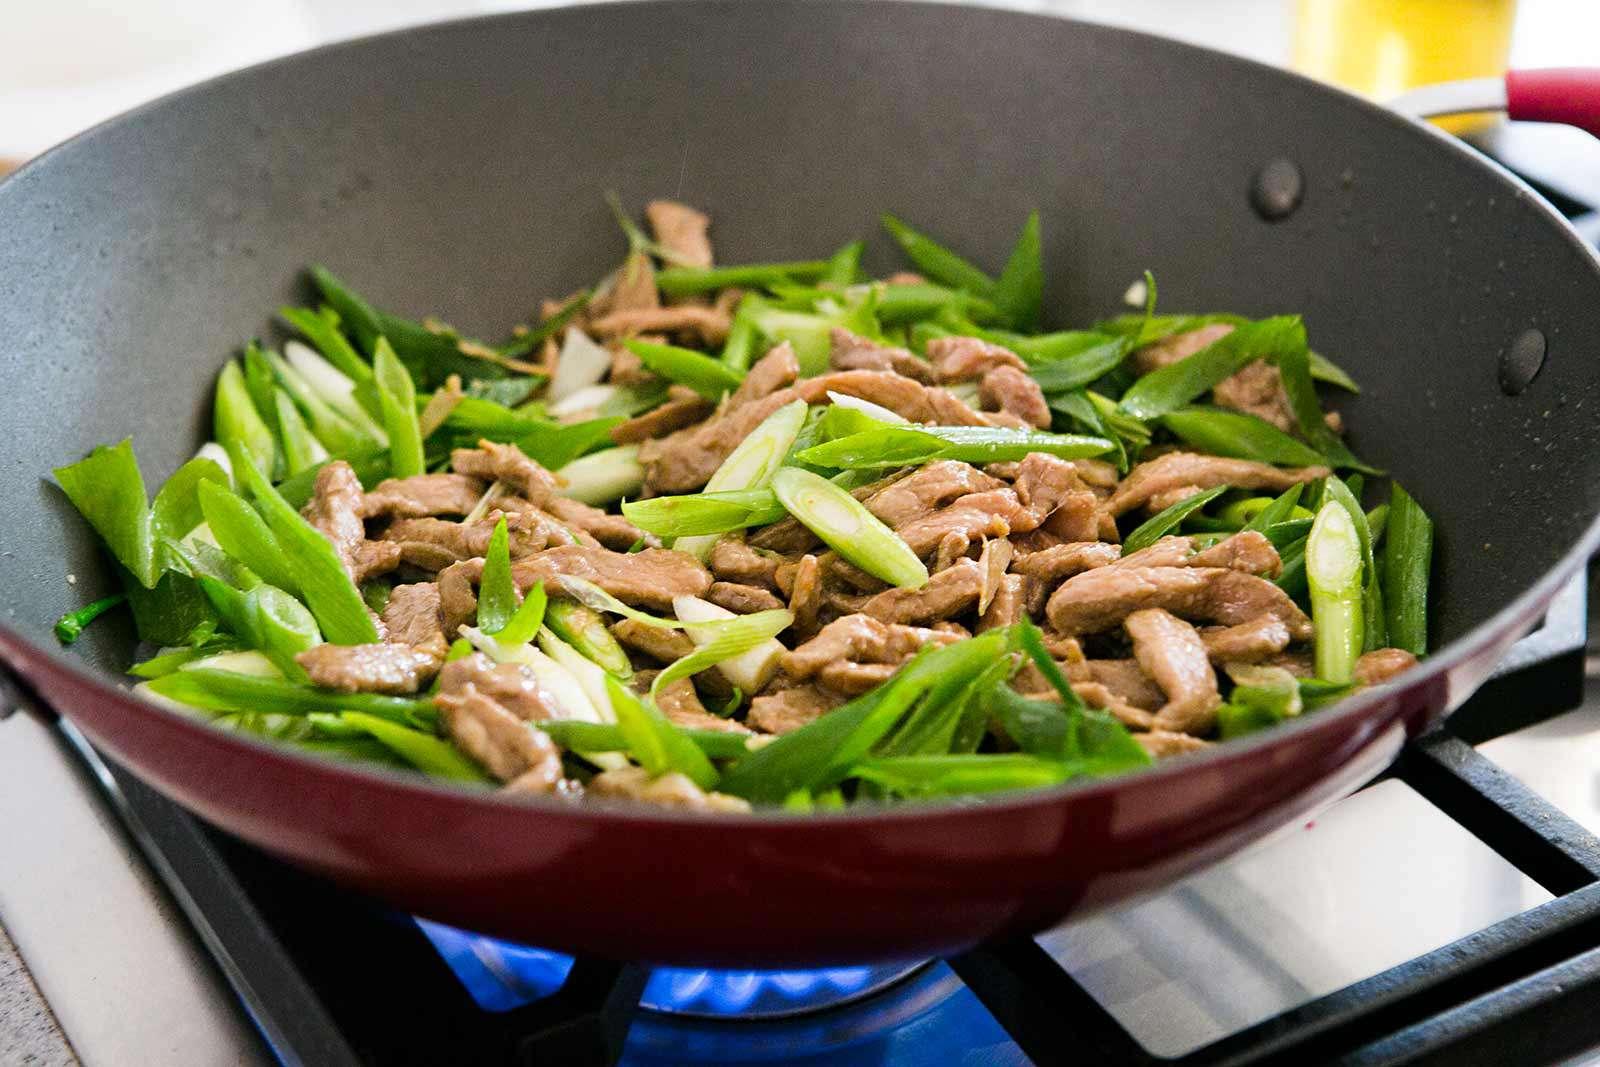 Pork Stir Fry with Green Onions